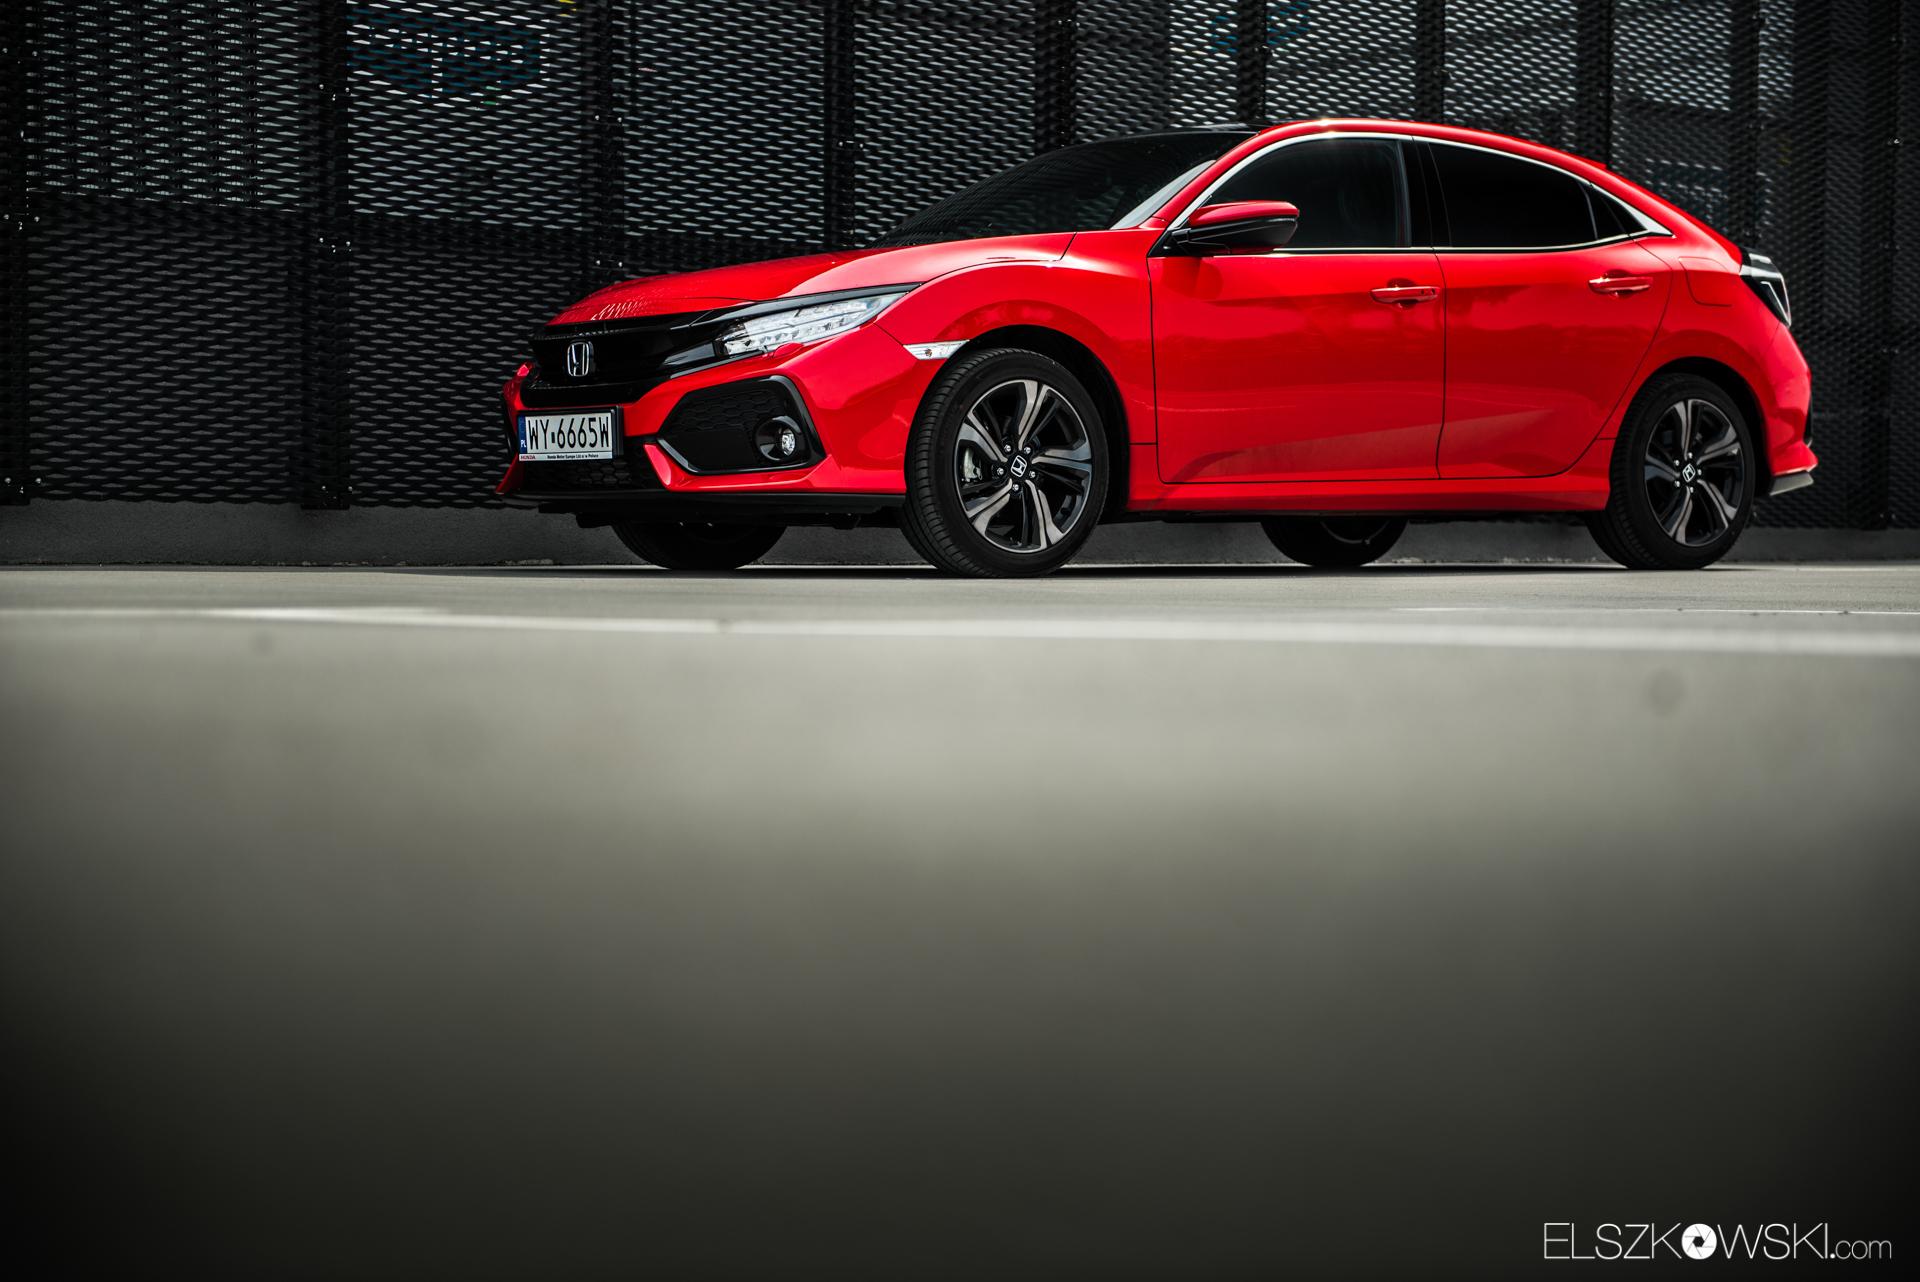 Honda Civic Sport red